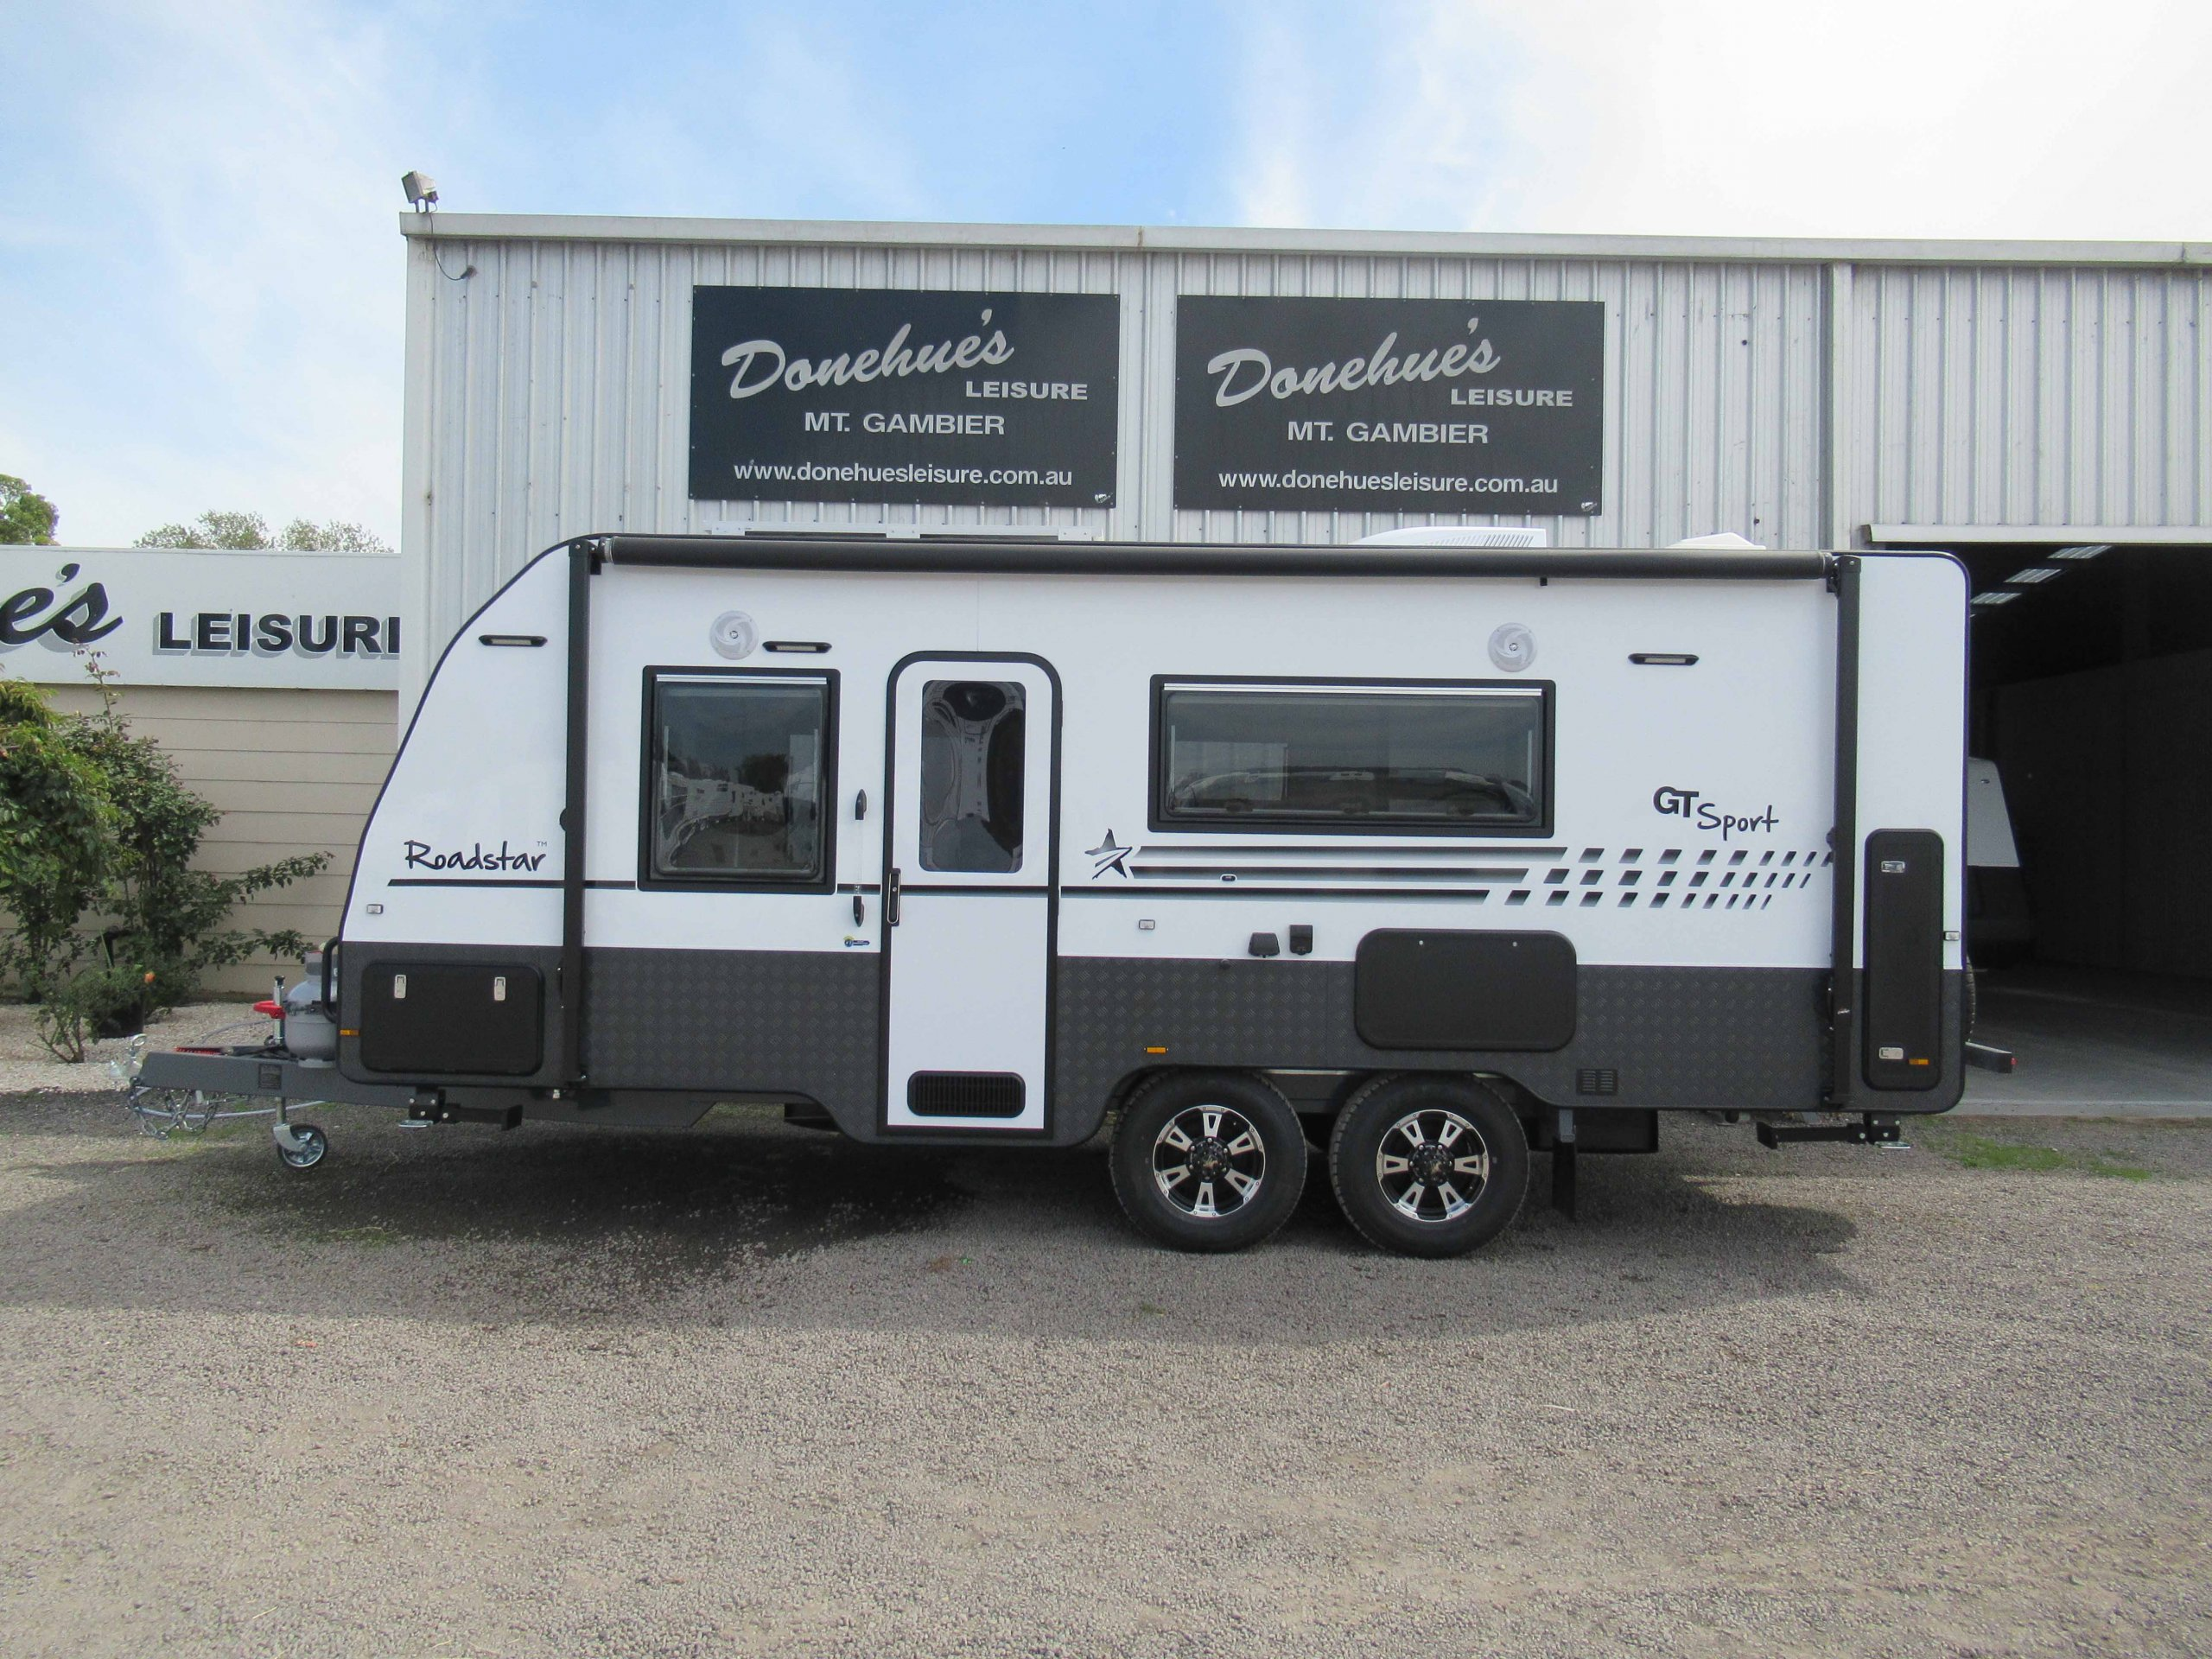 Donehues Leisure New Roadstar GT Sport Caravan Mt Gambier 12442